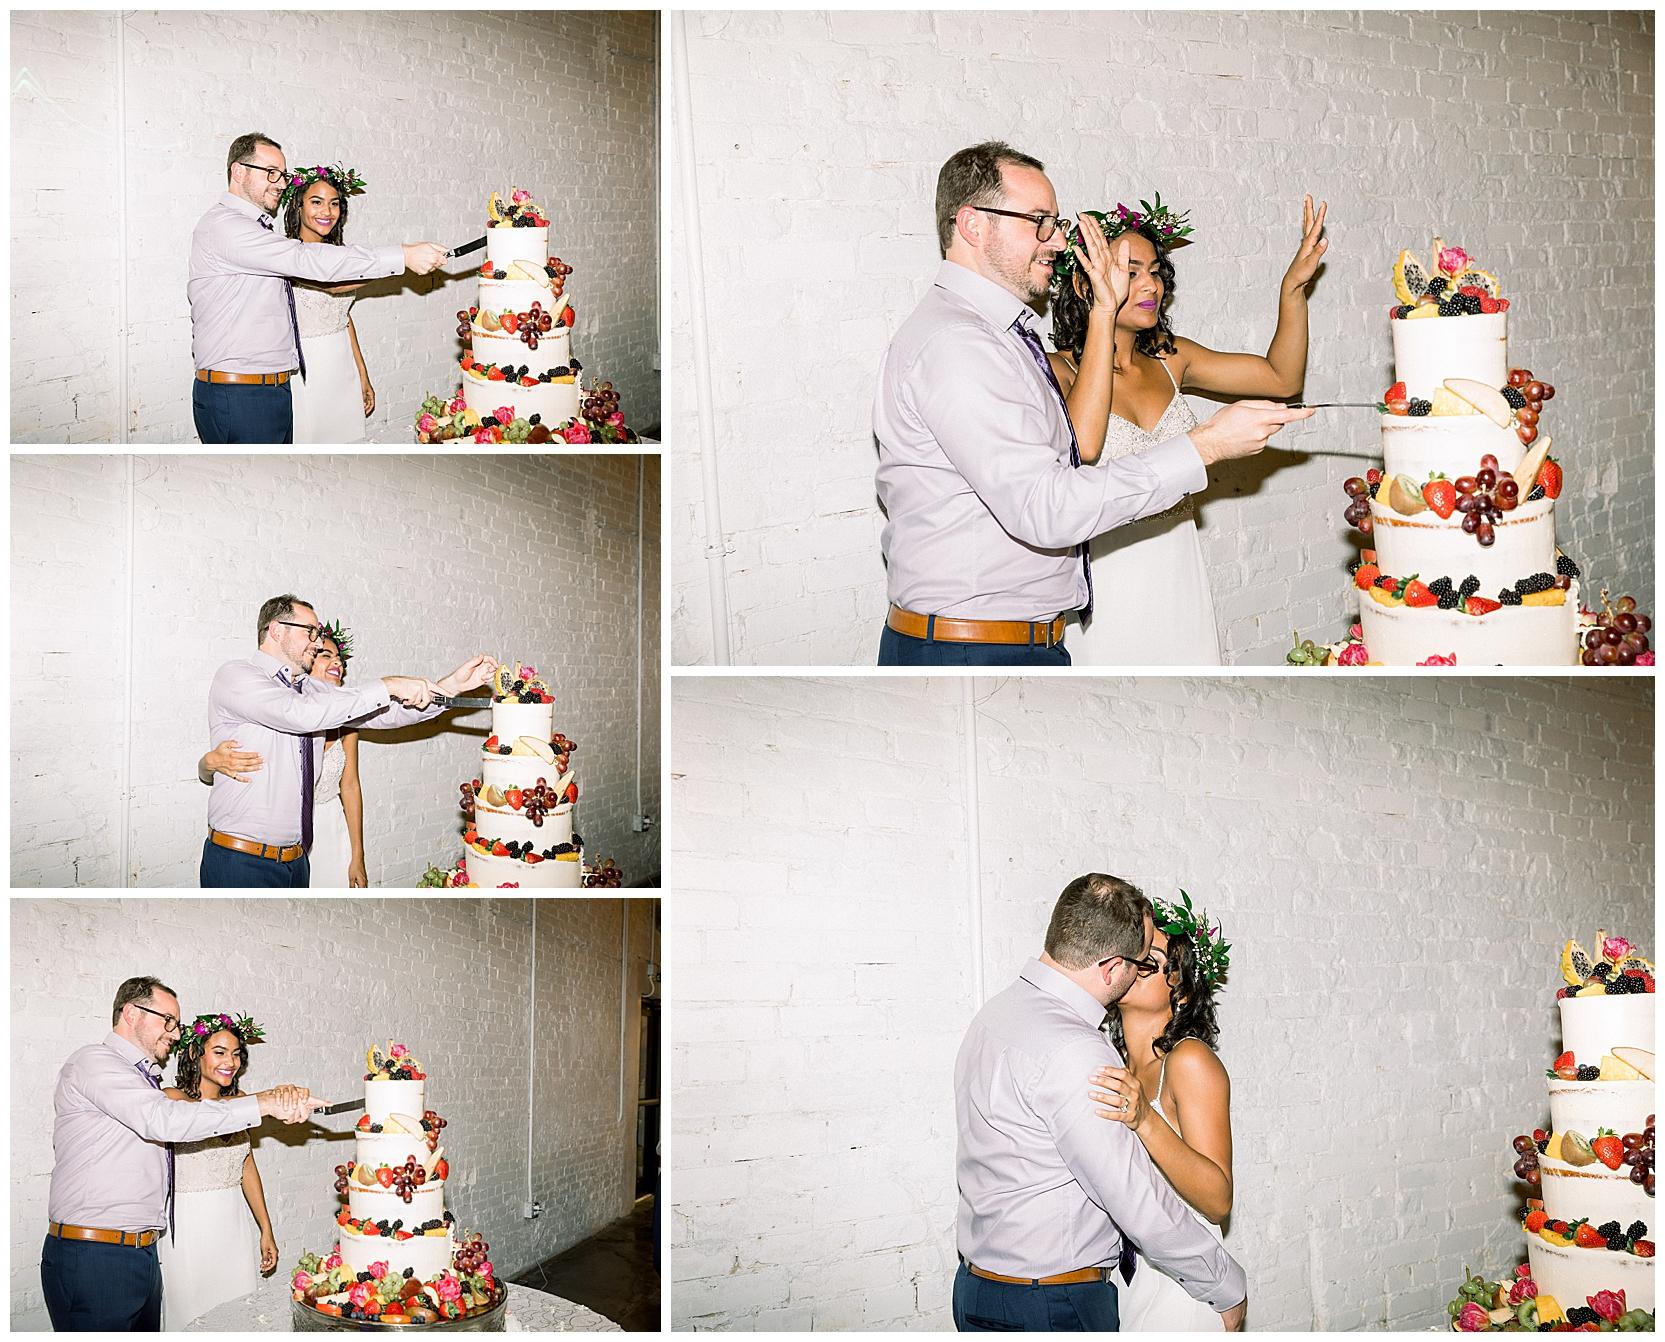 jessicafredericks_lakeland_tampa_wedding_purple_crazy hour_0100.jpg